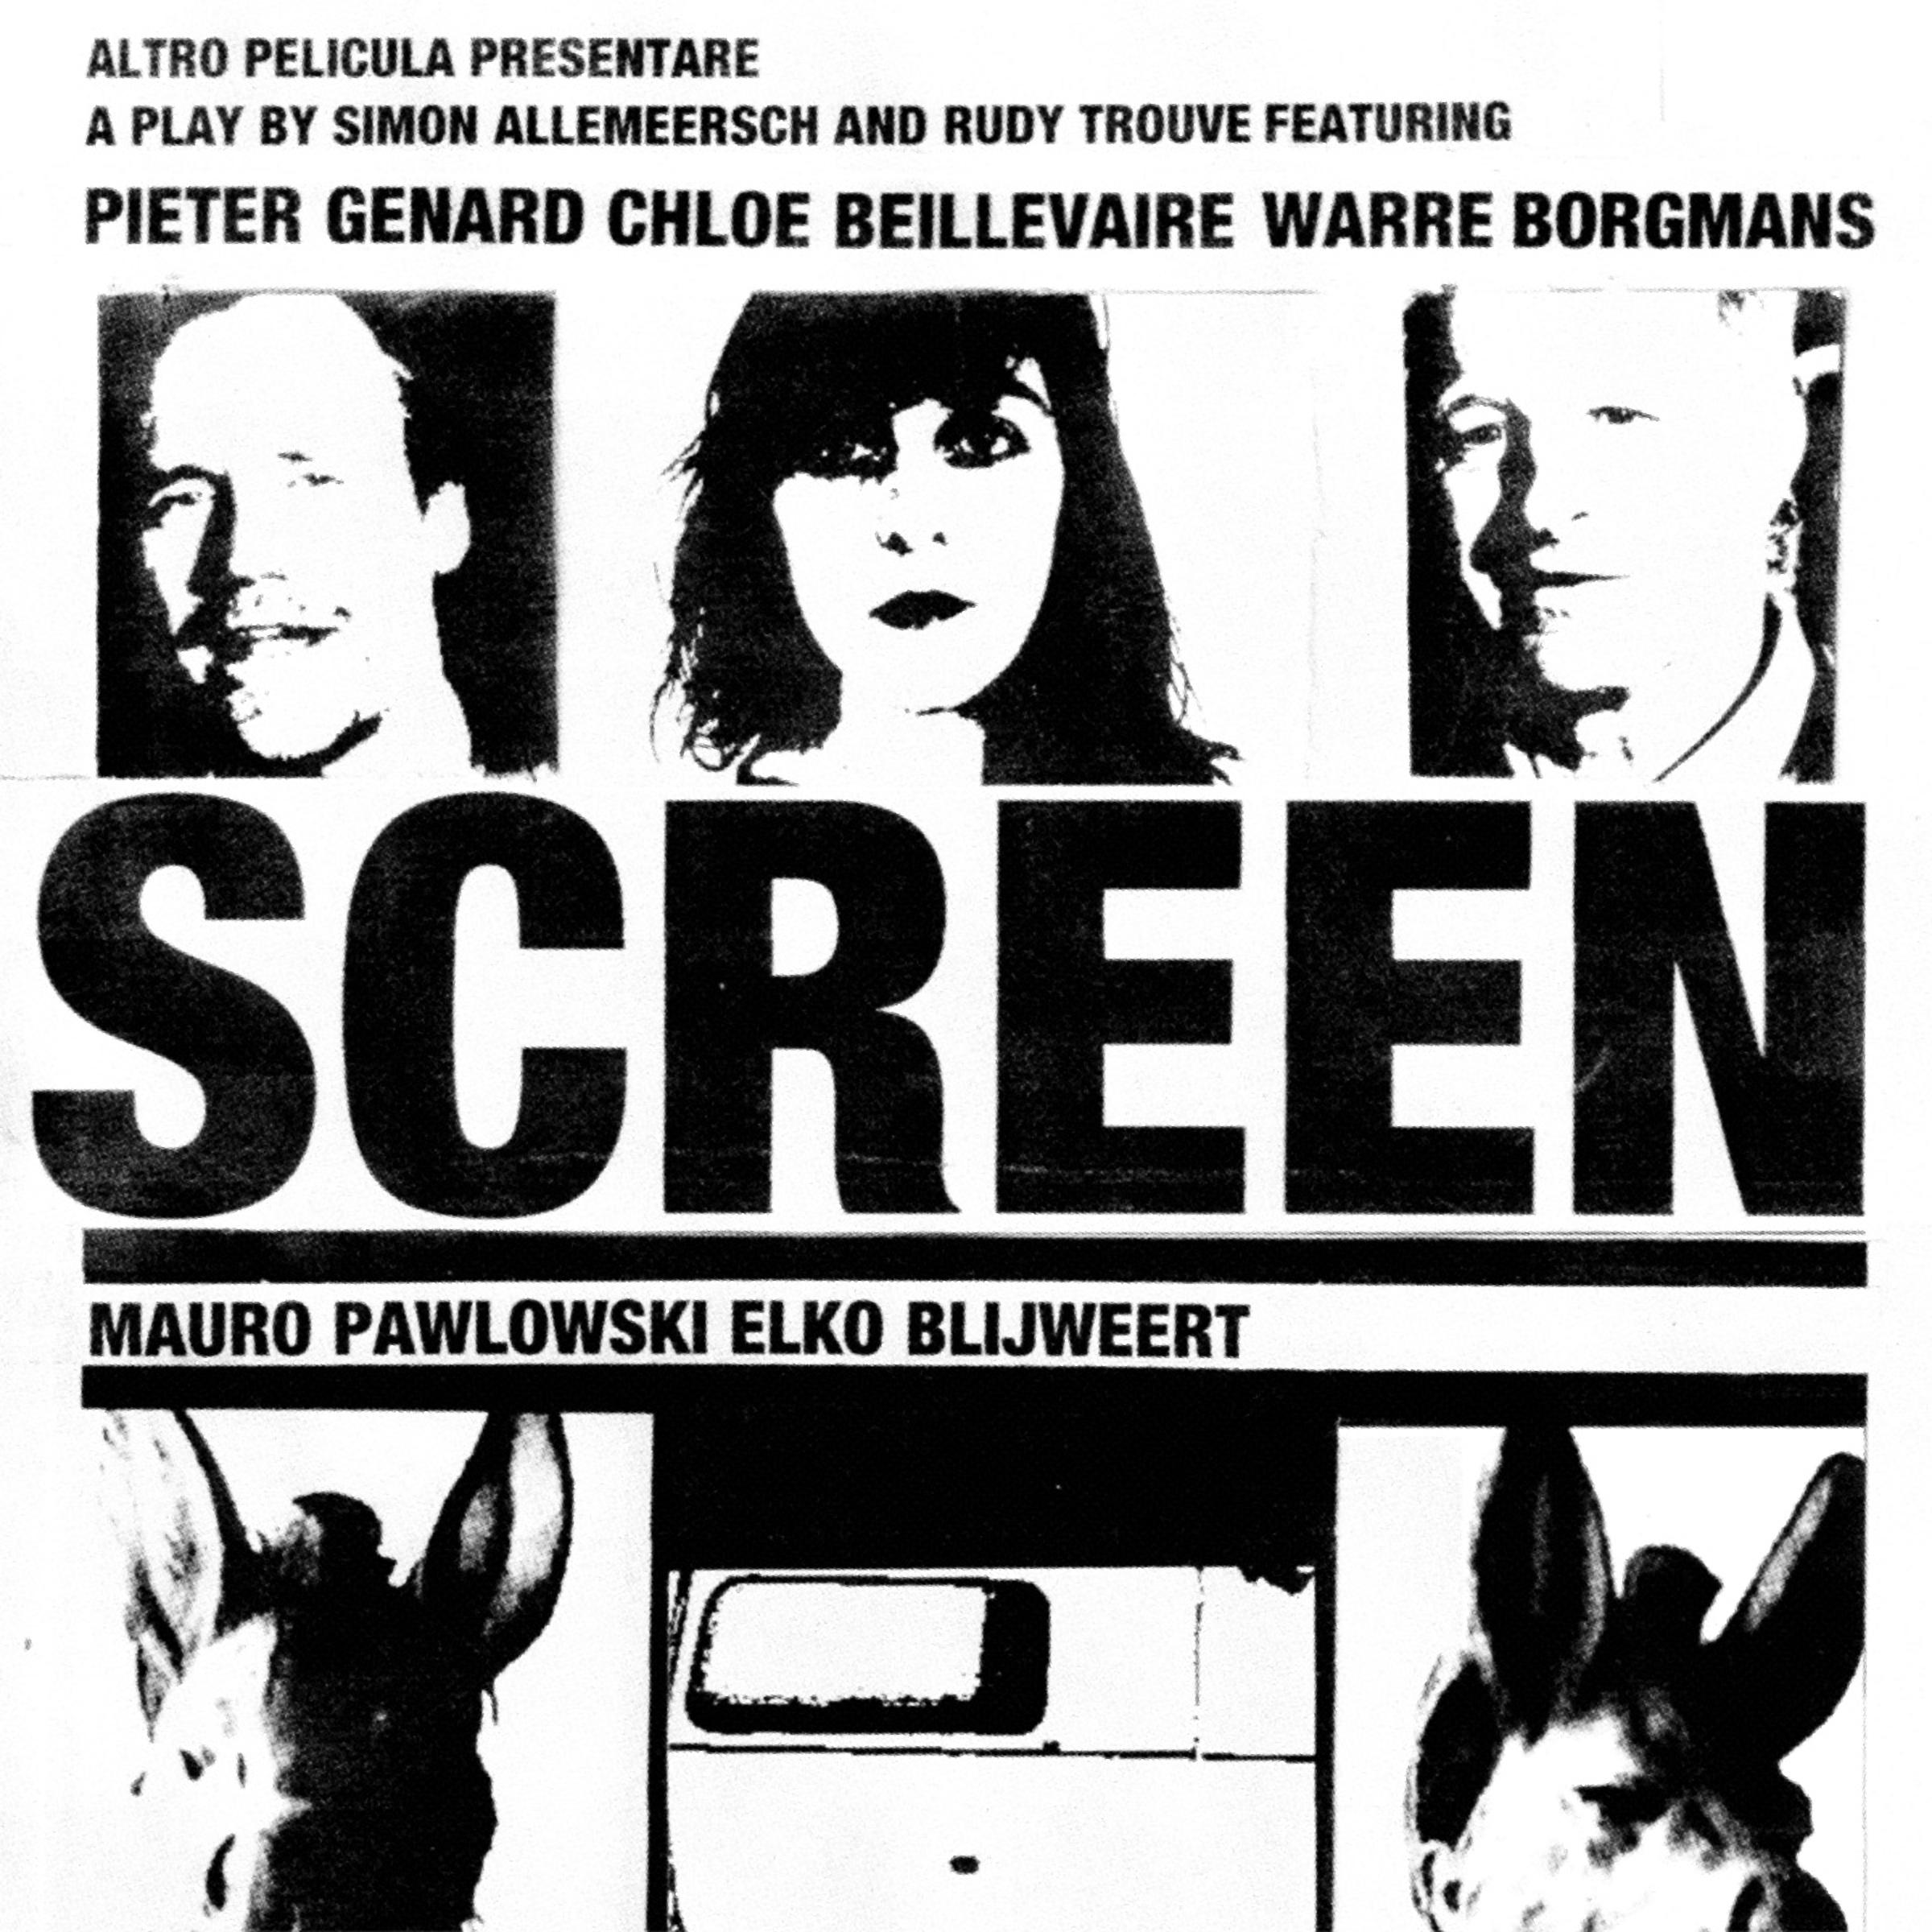 SCREEN/Crossroads Soundtrack by Rudy Trouve, Elko Blijweert, Mauro Pawlowski and Gunter Nagels